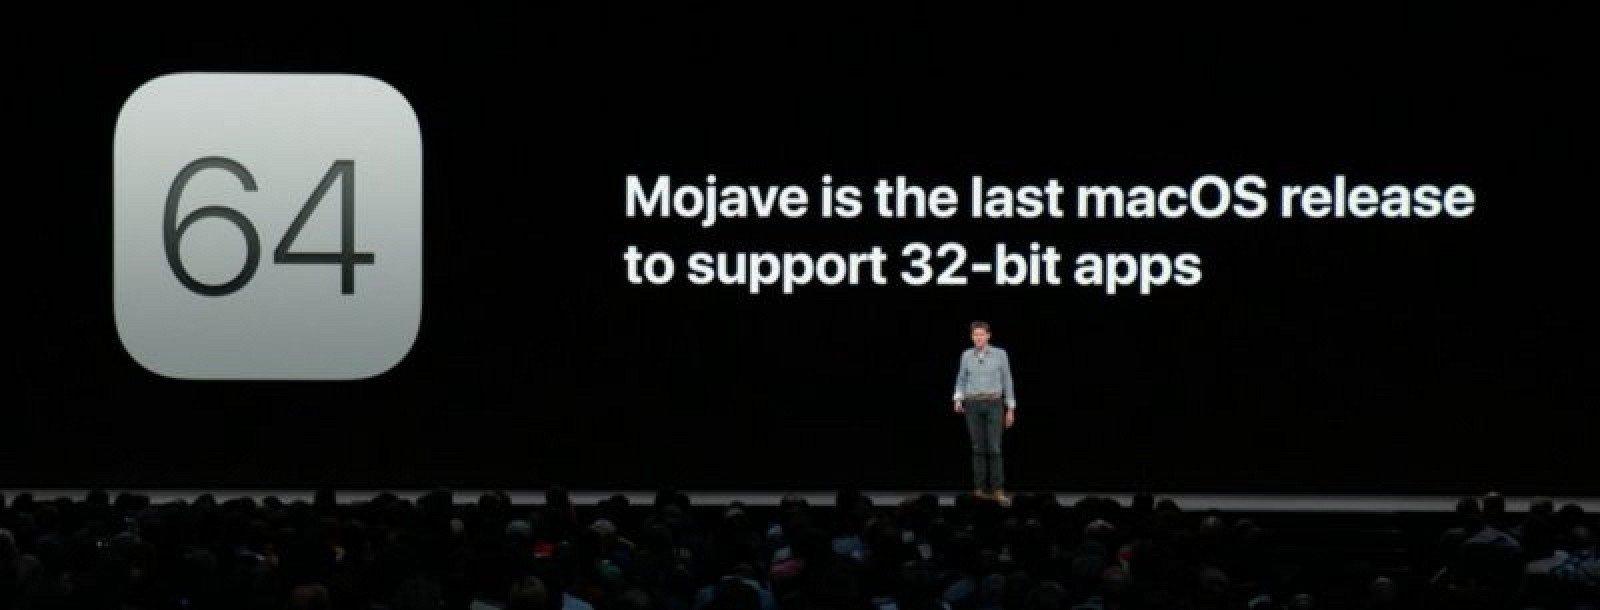 mojave-32-bit-apps